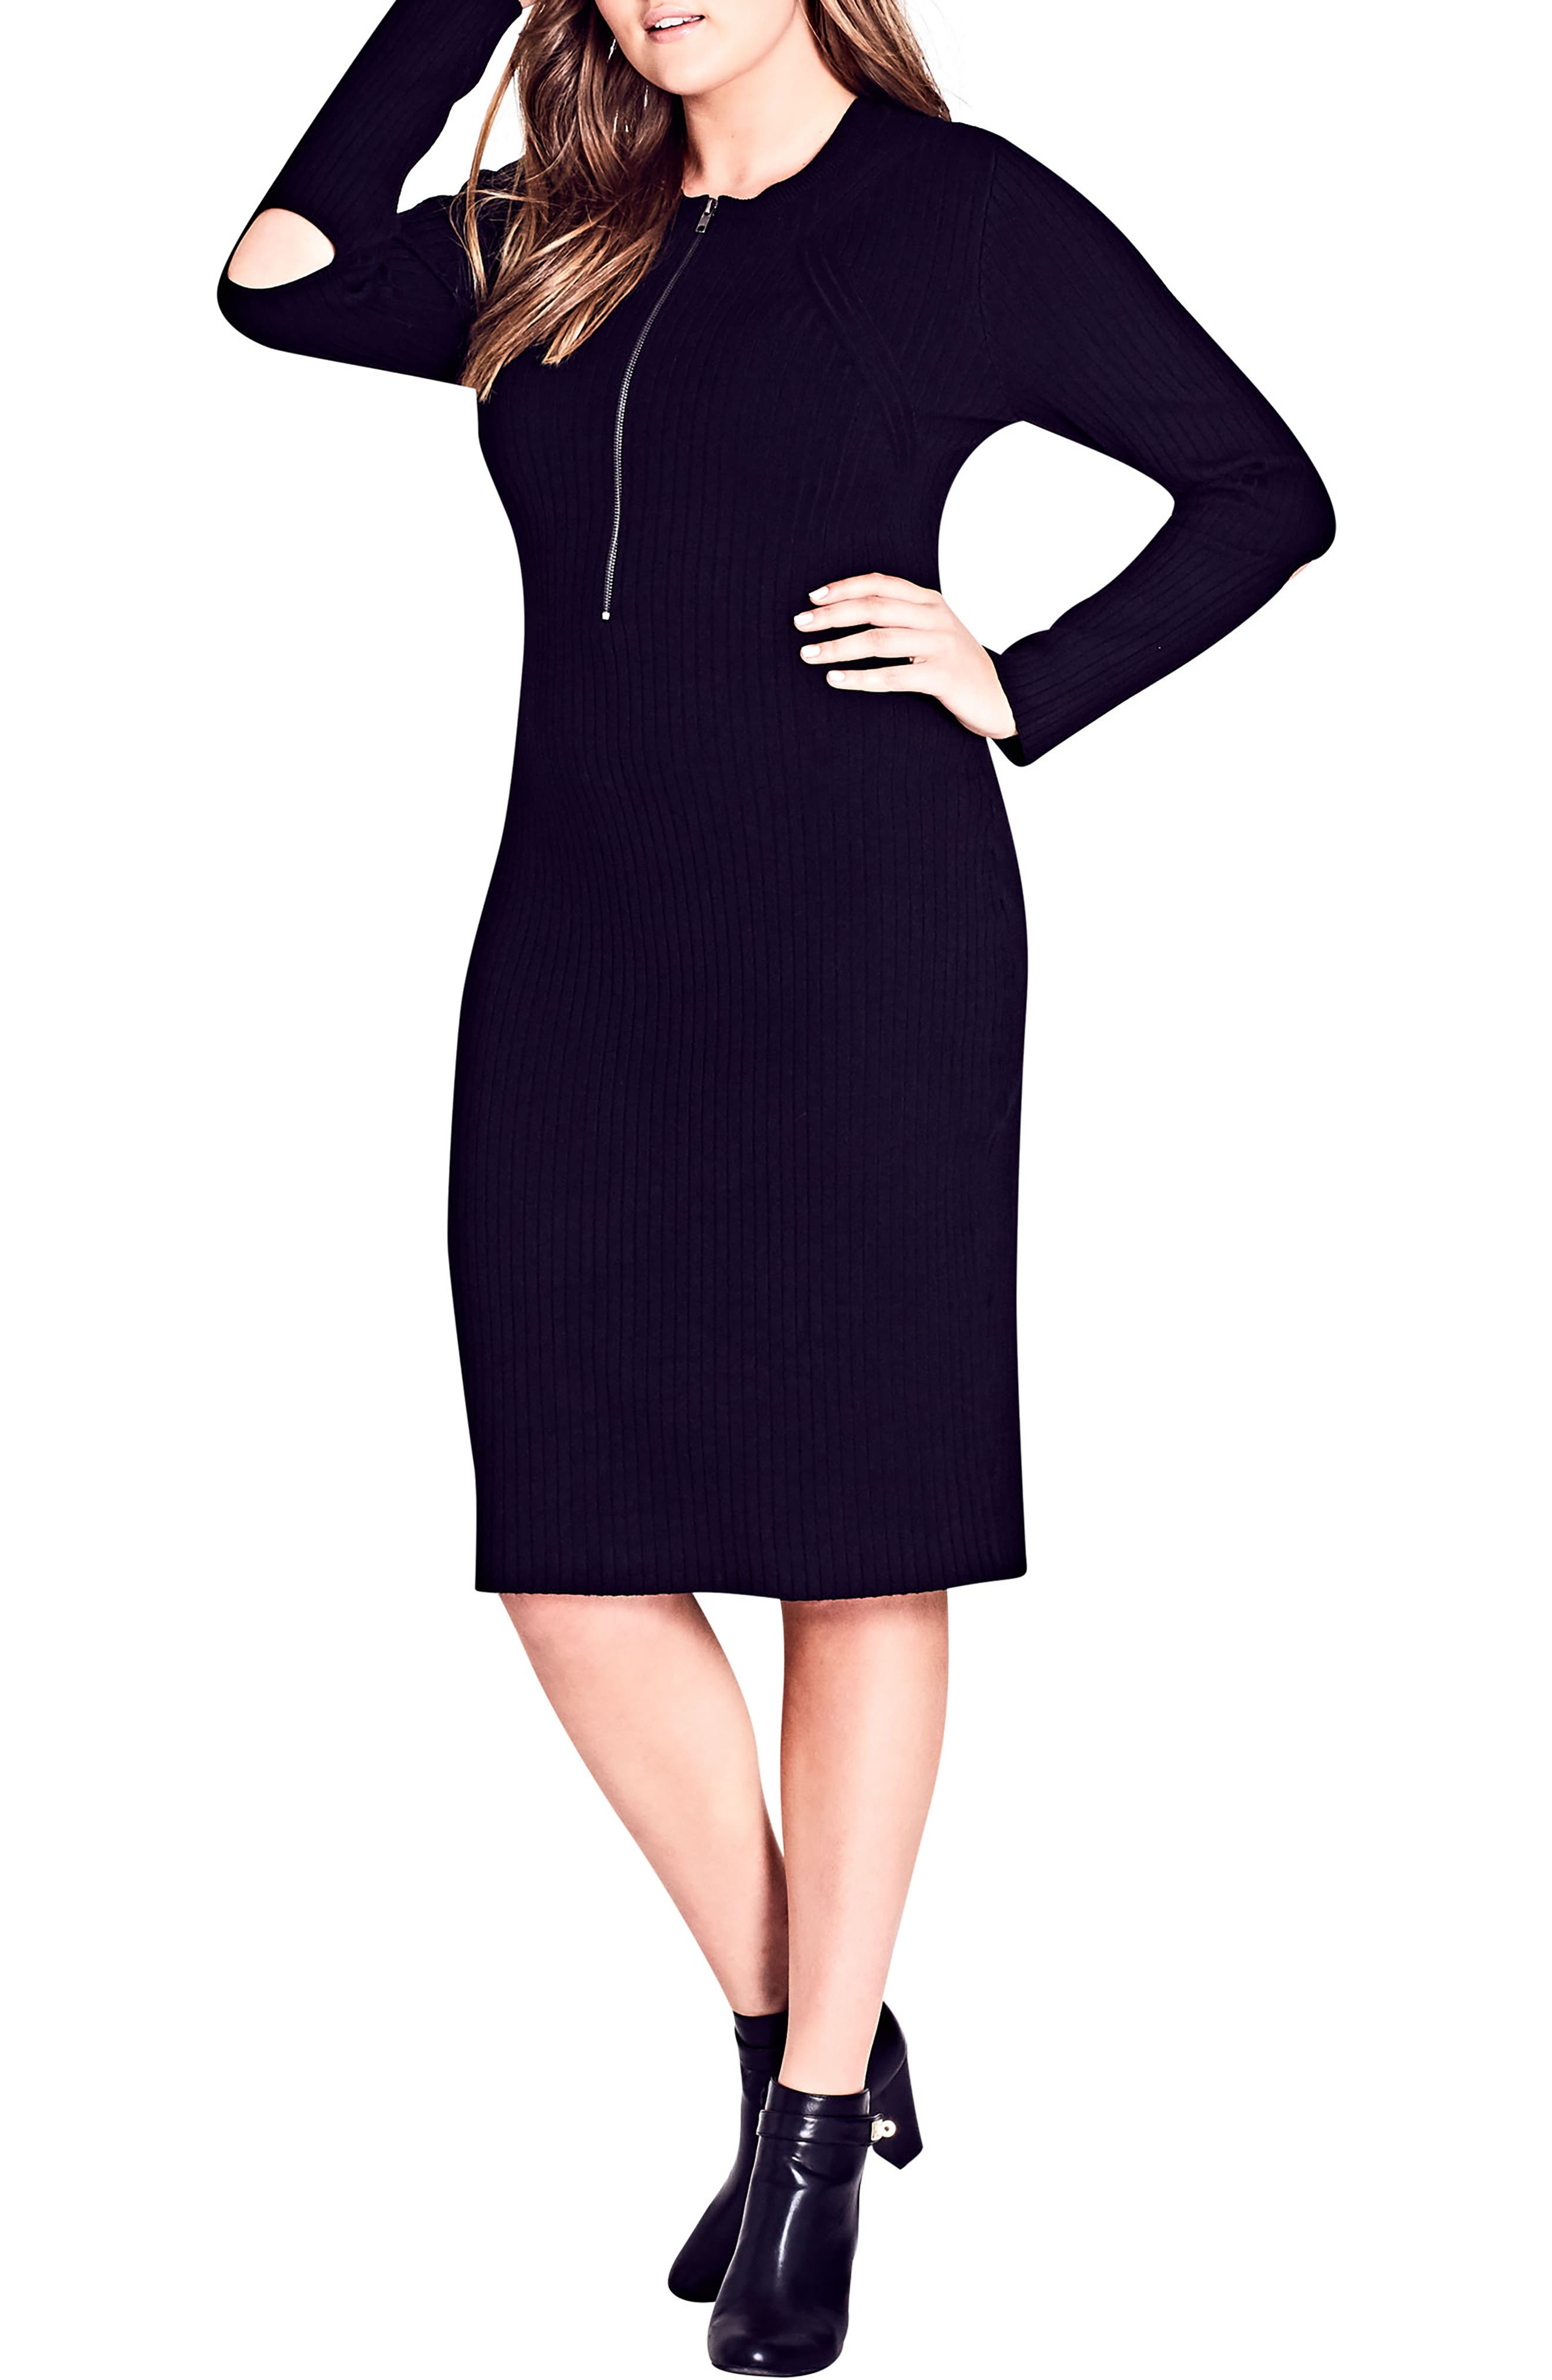 Zipped Up Sweater Dress,                             Main thumbnail 1, color,                             Black